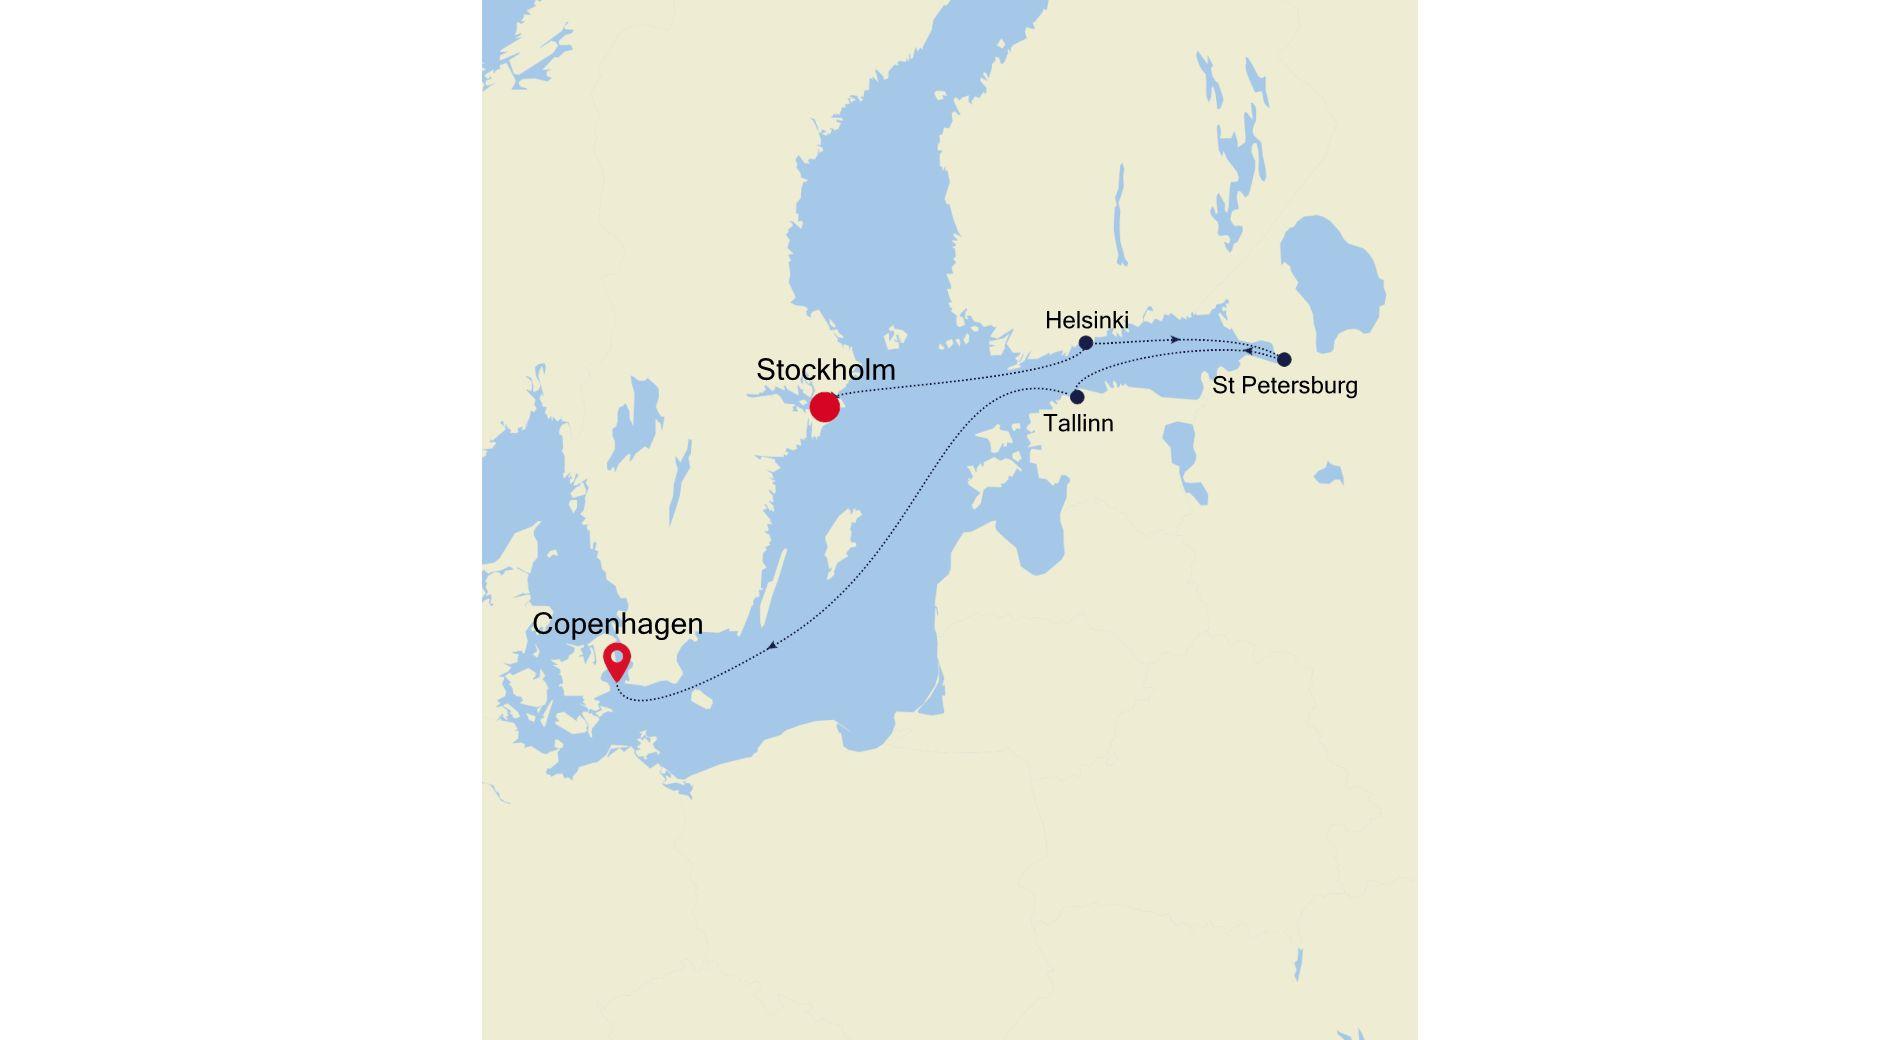 SL210629007 - Stockholm a Copenhagen